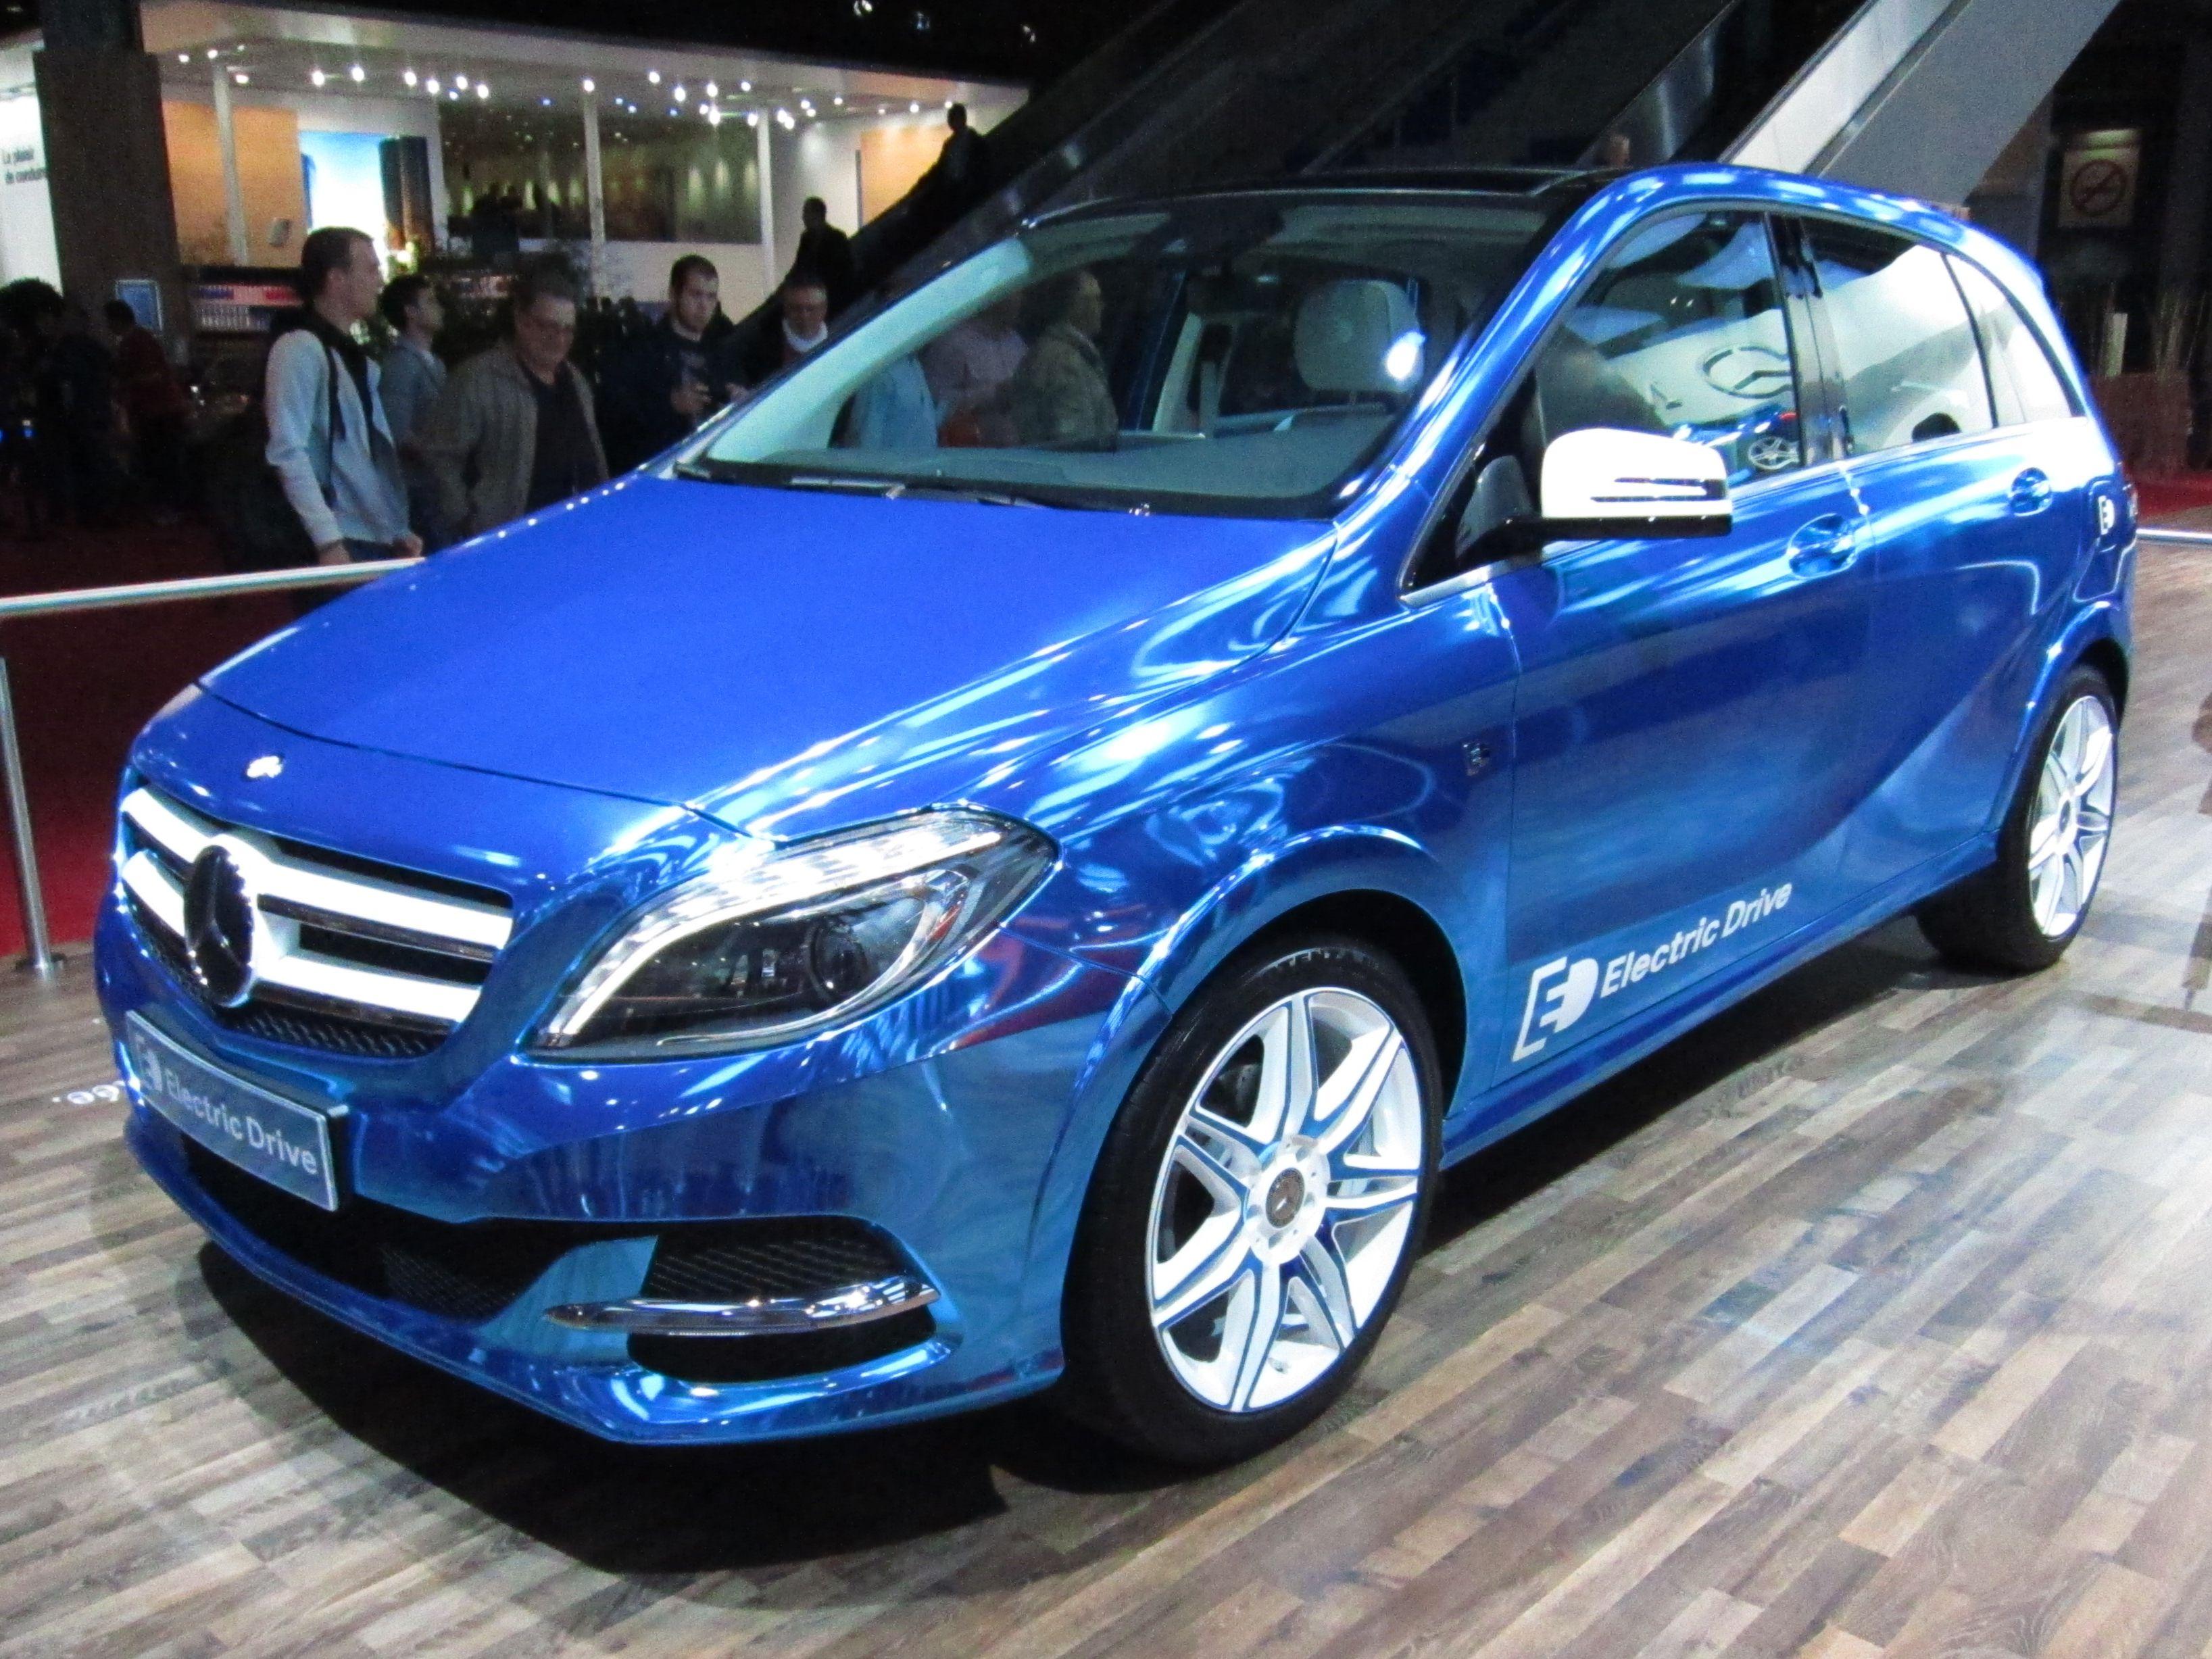 2015 Mercedes-Benz B-Class Electric Car Configurator Now Live